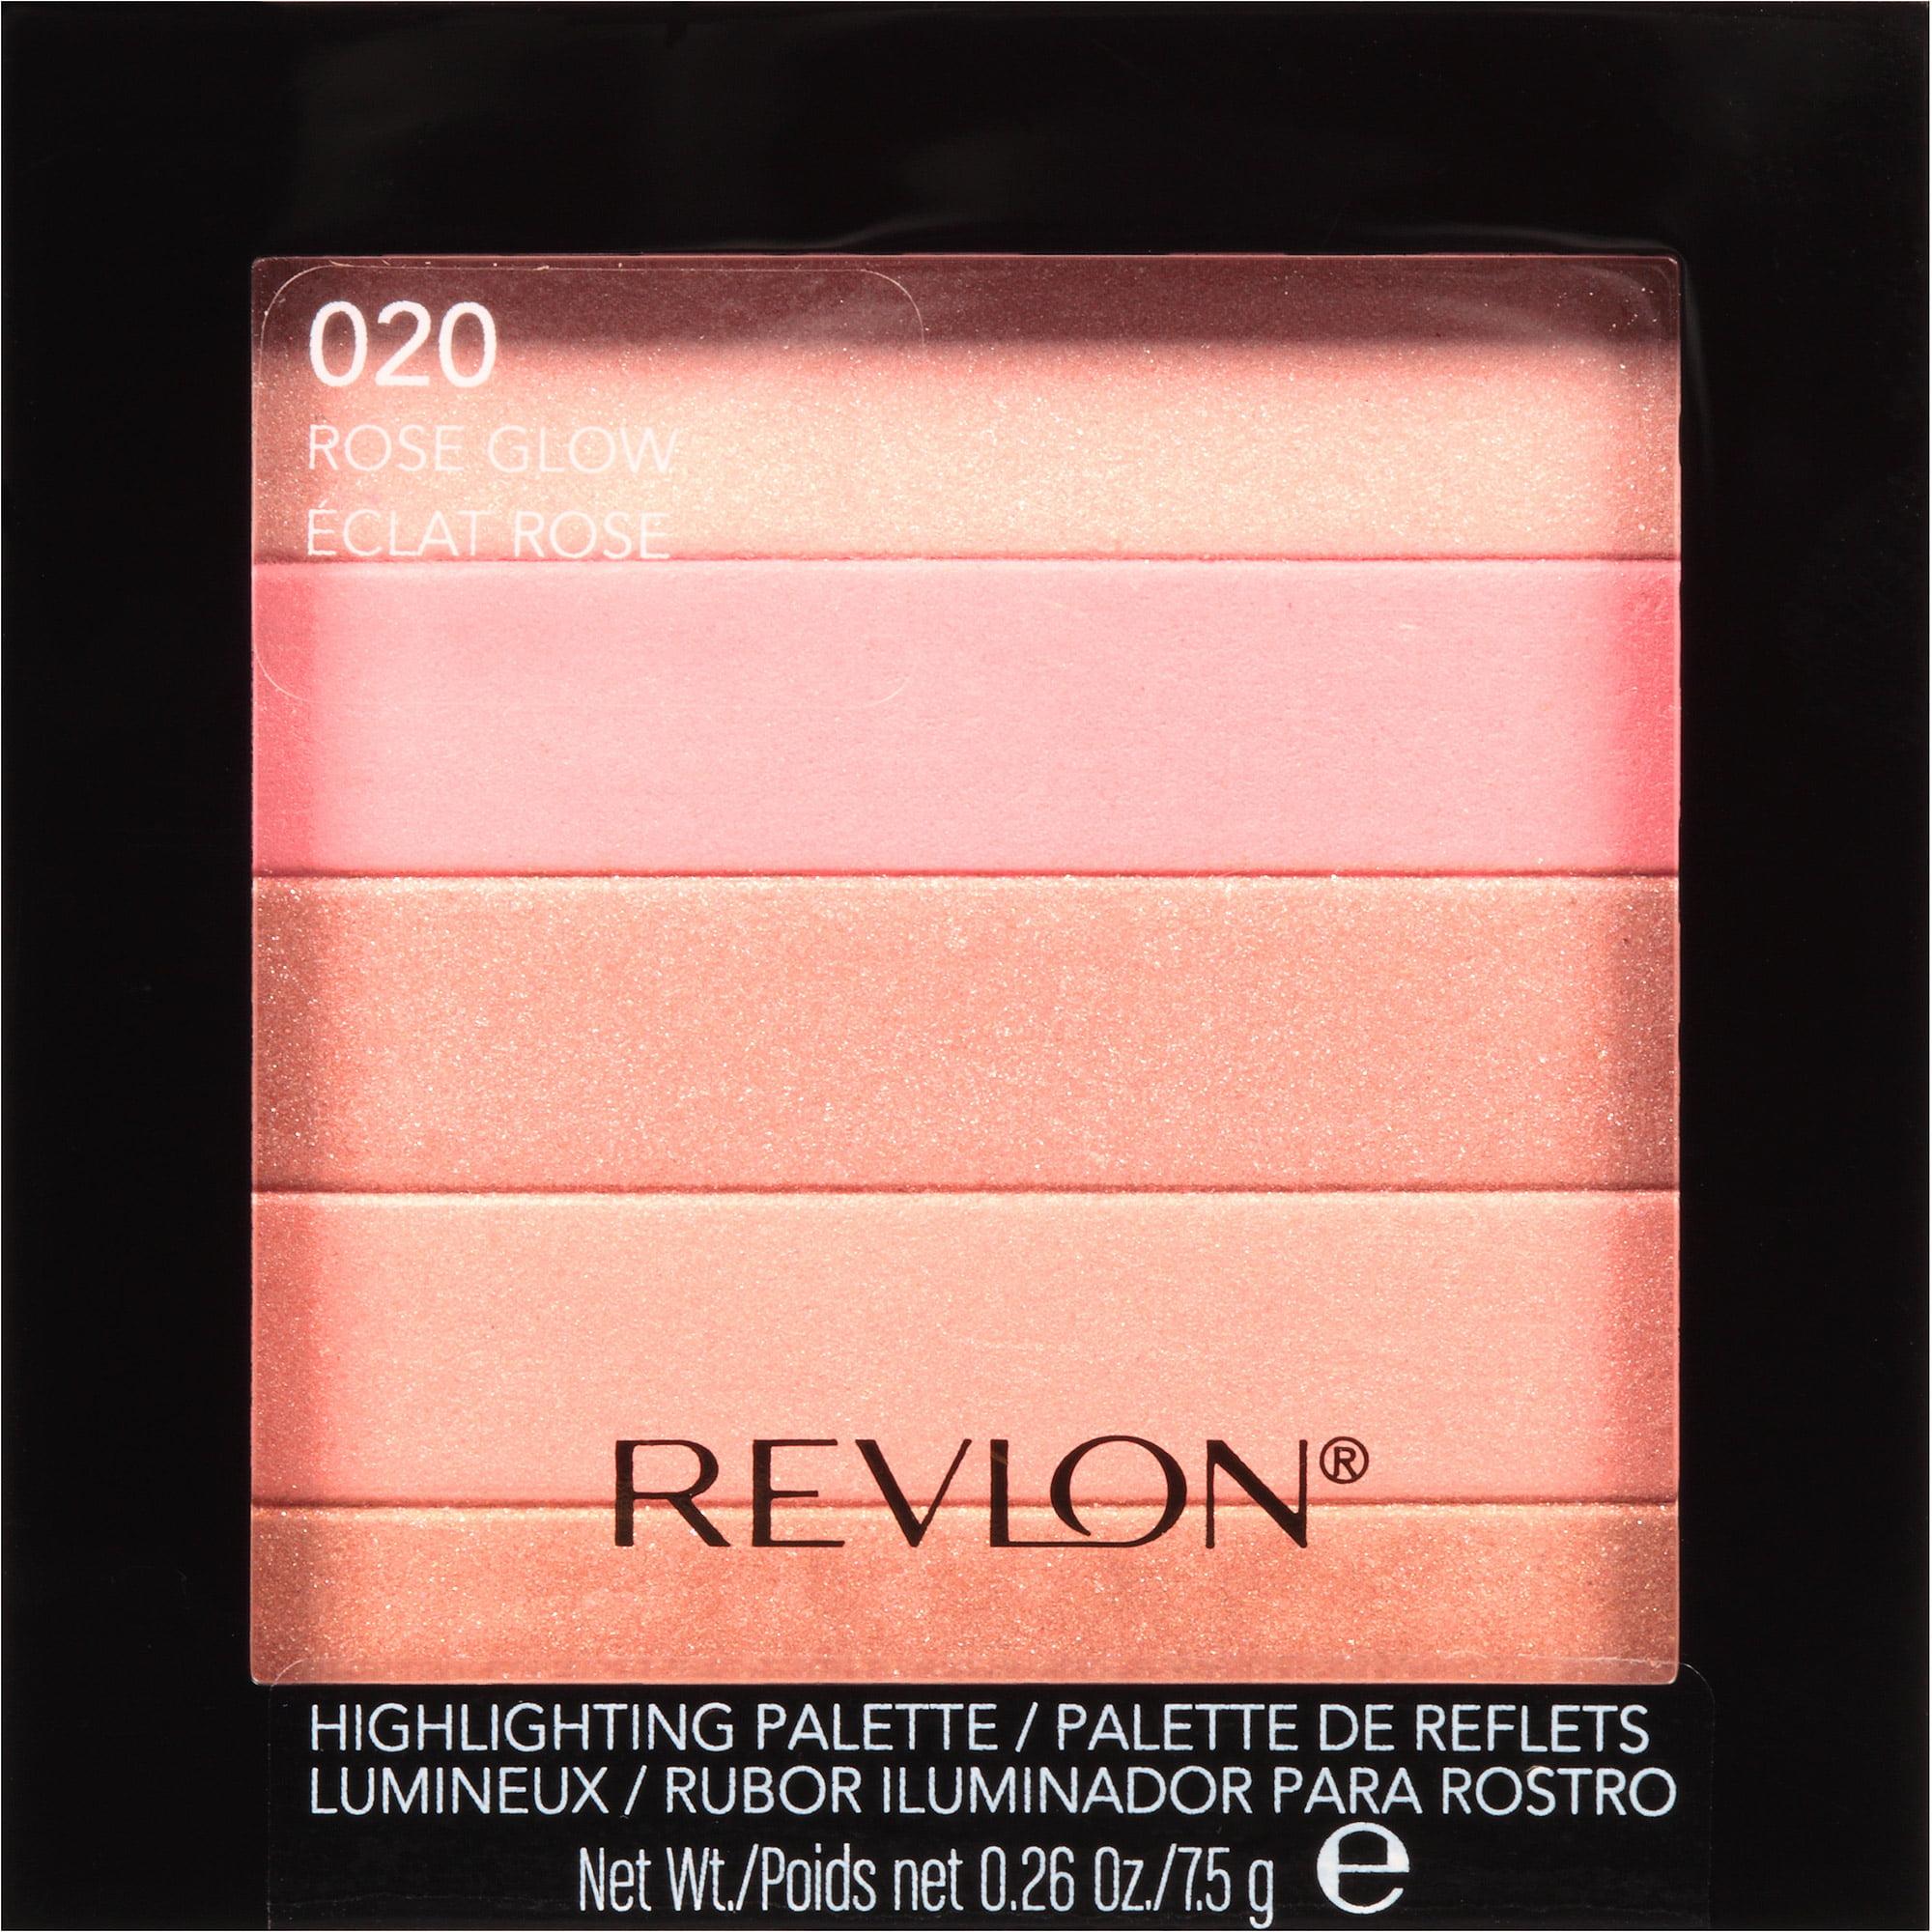 Revlon Highlighting Palette, 020 Rose Glow, 0.26 oz